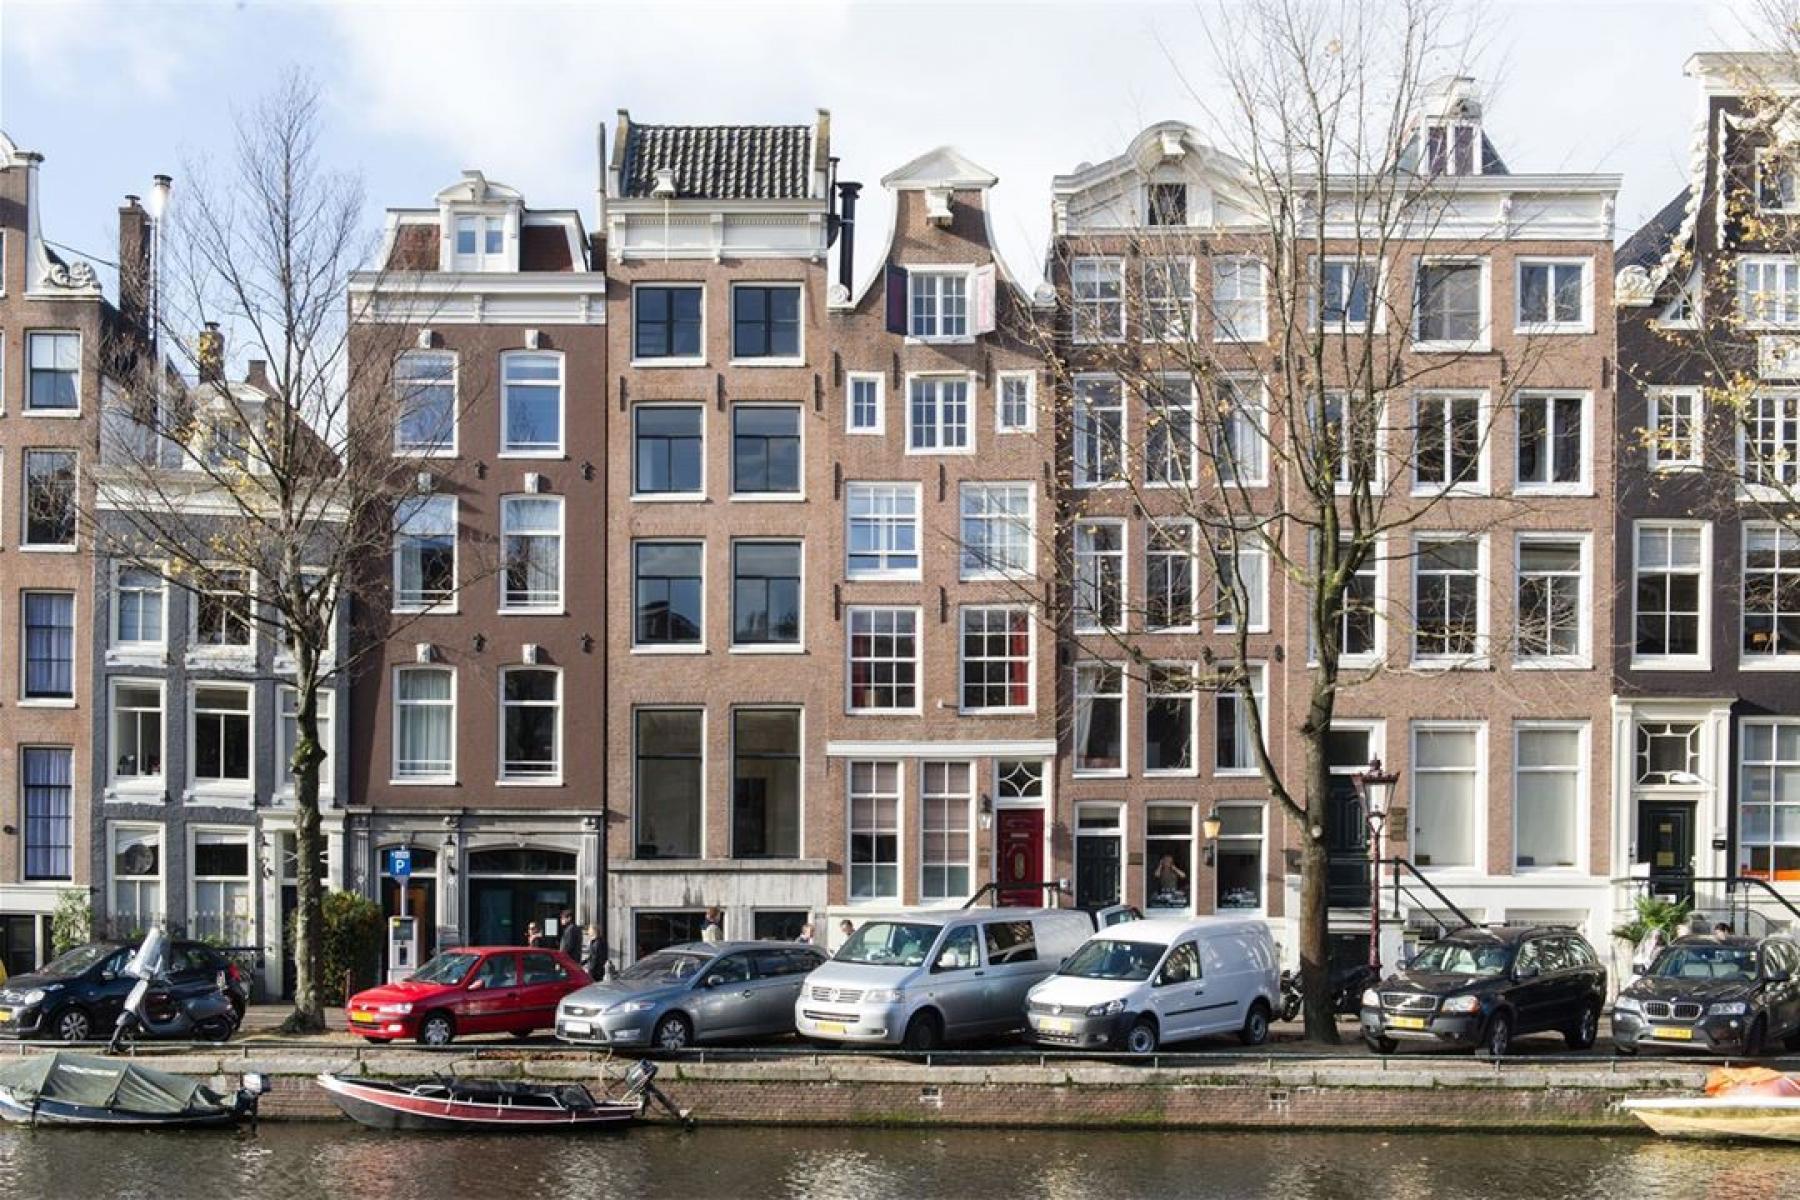 kantoorruimte huren singel 146 amsterdam